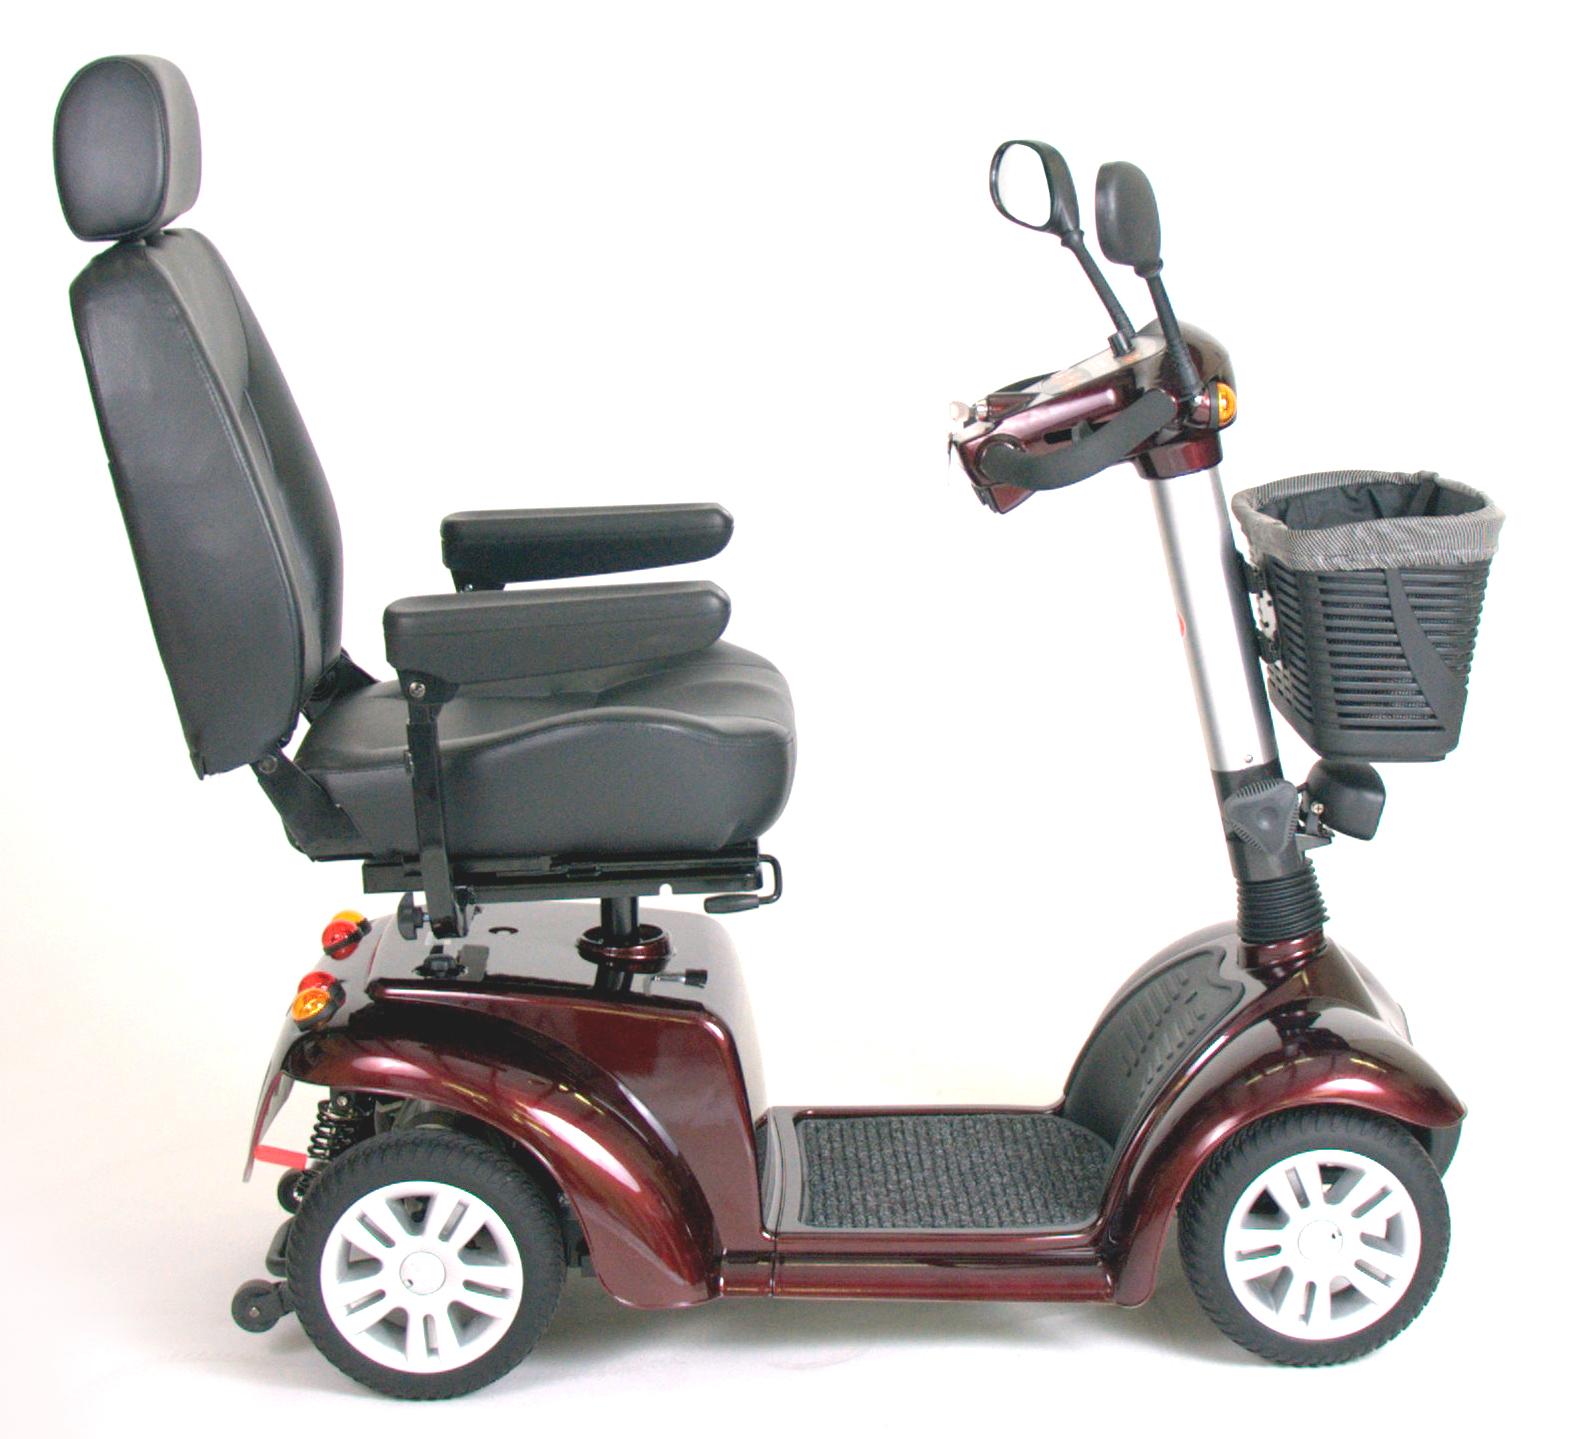 pilot-4-wheel-power-scooter-pilot2410bg20cs-drive-medical-3.jpg